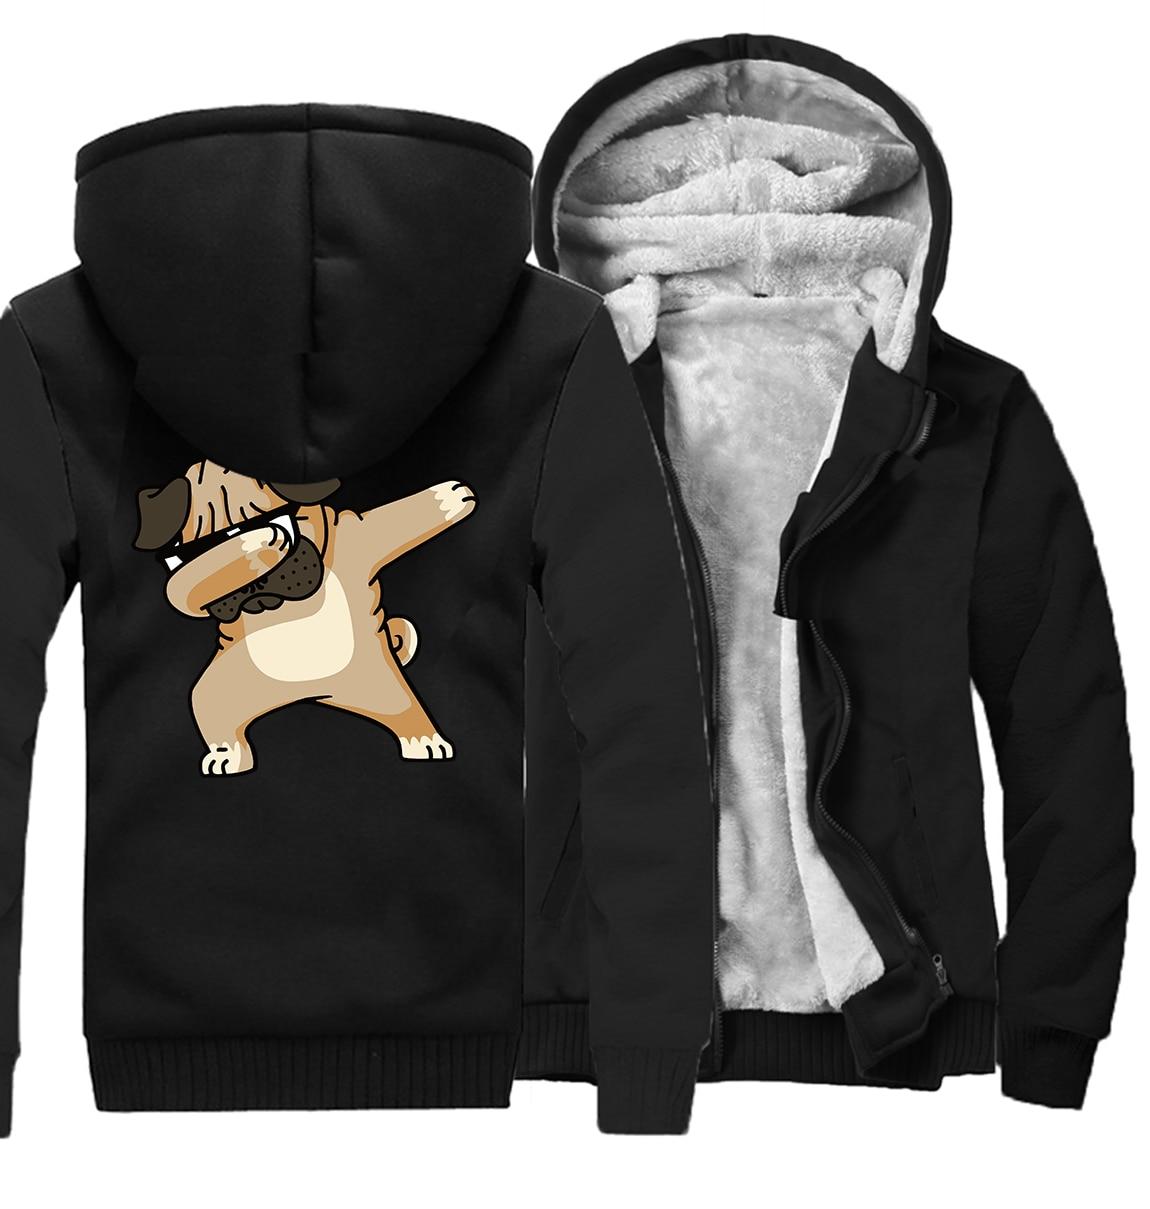 casual wool liner keep warm sweatshirts Novelty Dabbing Pug hooded jackets Men hip hop sportswear tracksuits 2019 winter hoodies in Hoodies amp Sweatshirts from Men 39 s Clothing